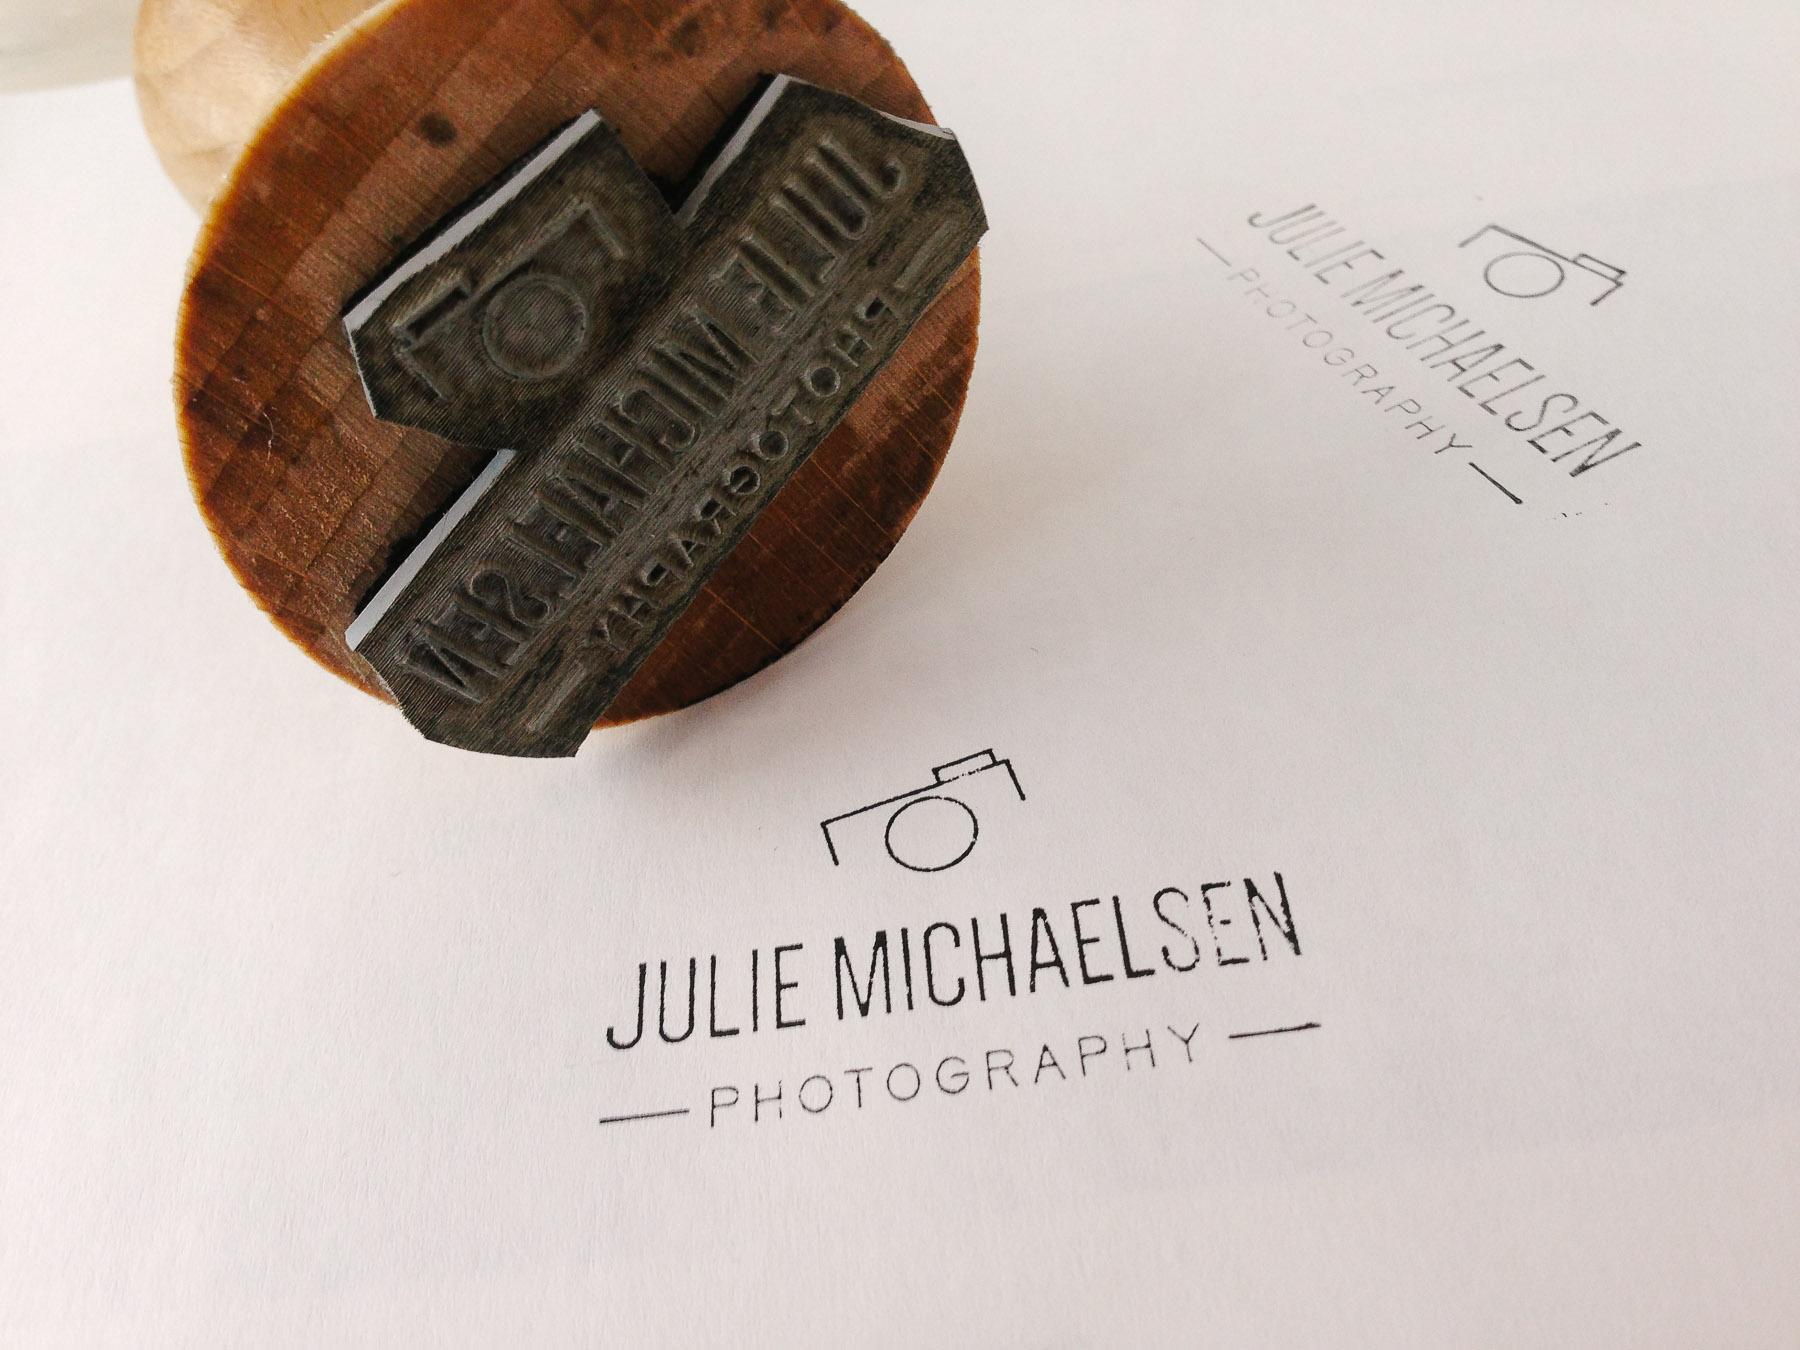 julie-michaelsen-photography-17.jpg